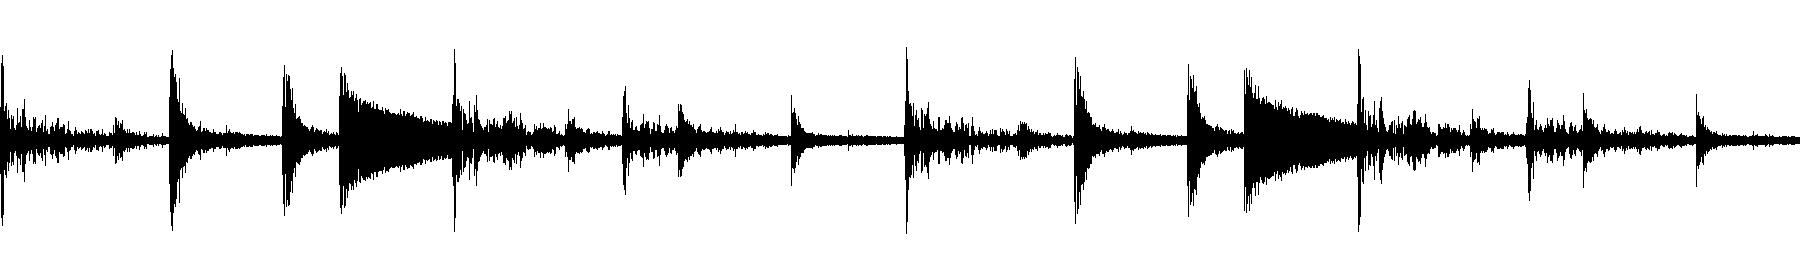 blbc jazzydrums 75 01